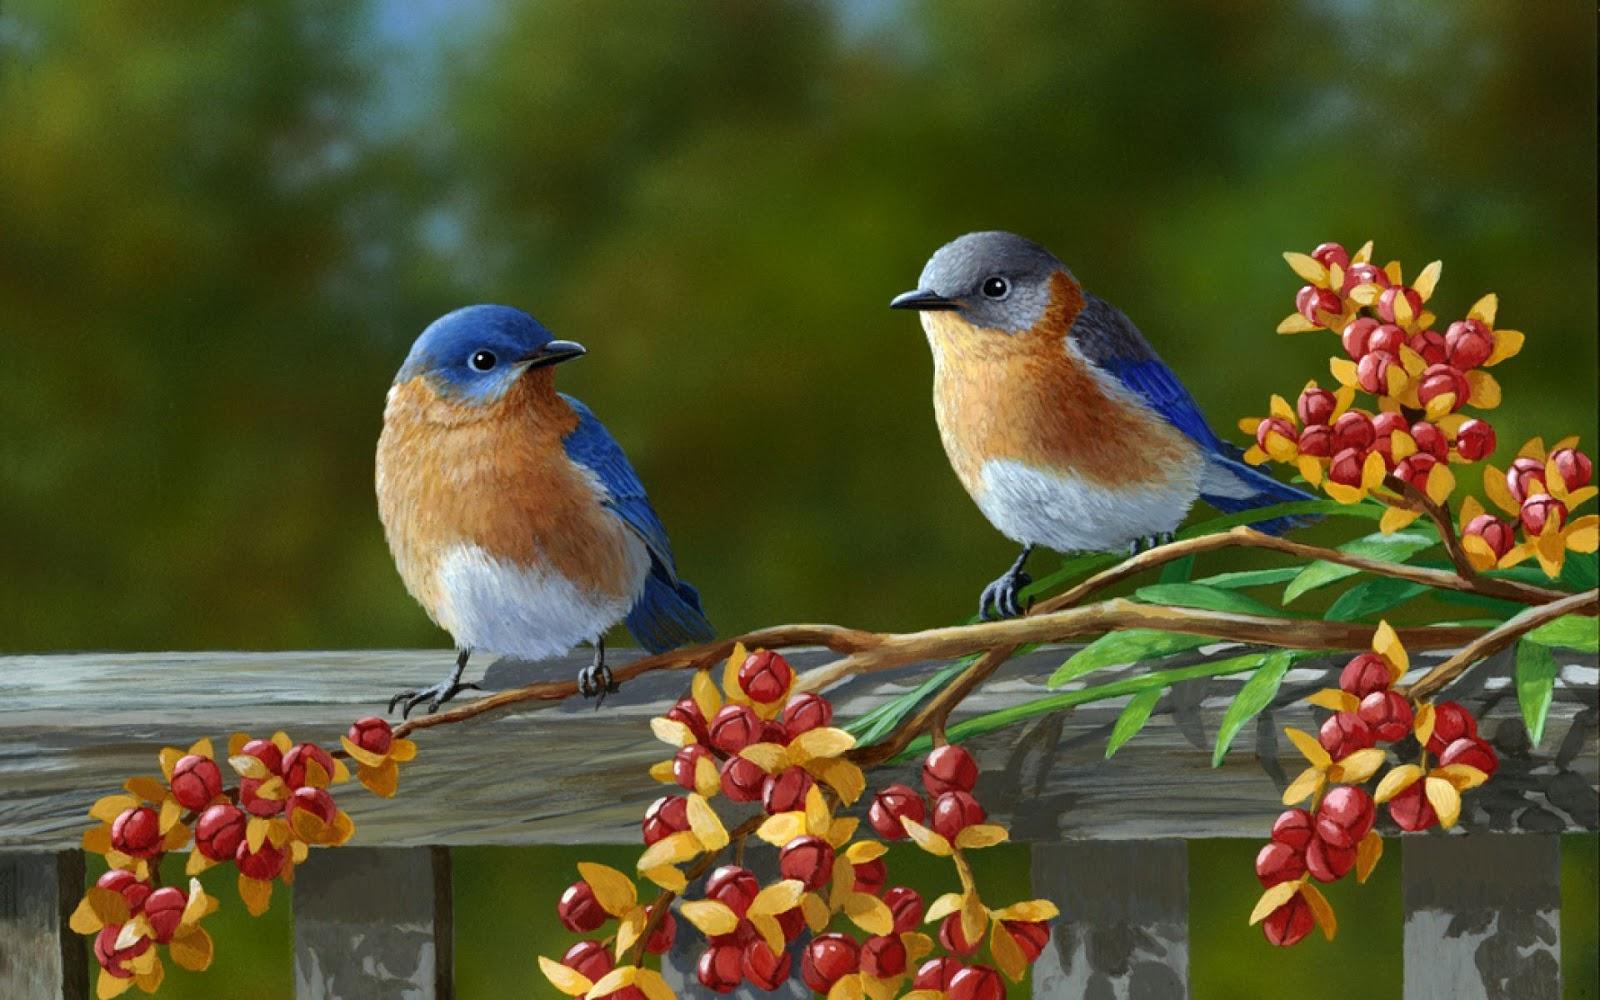 50 New Bird Wallpaper Images Pics Photos 2017 2018 Free Download